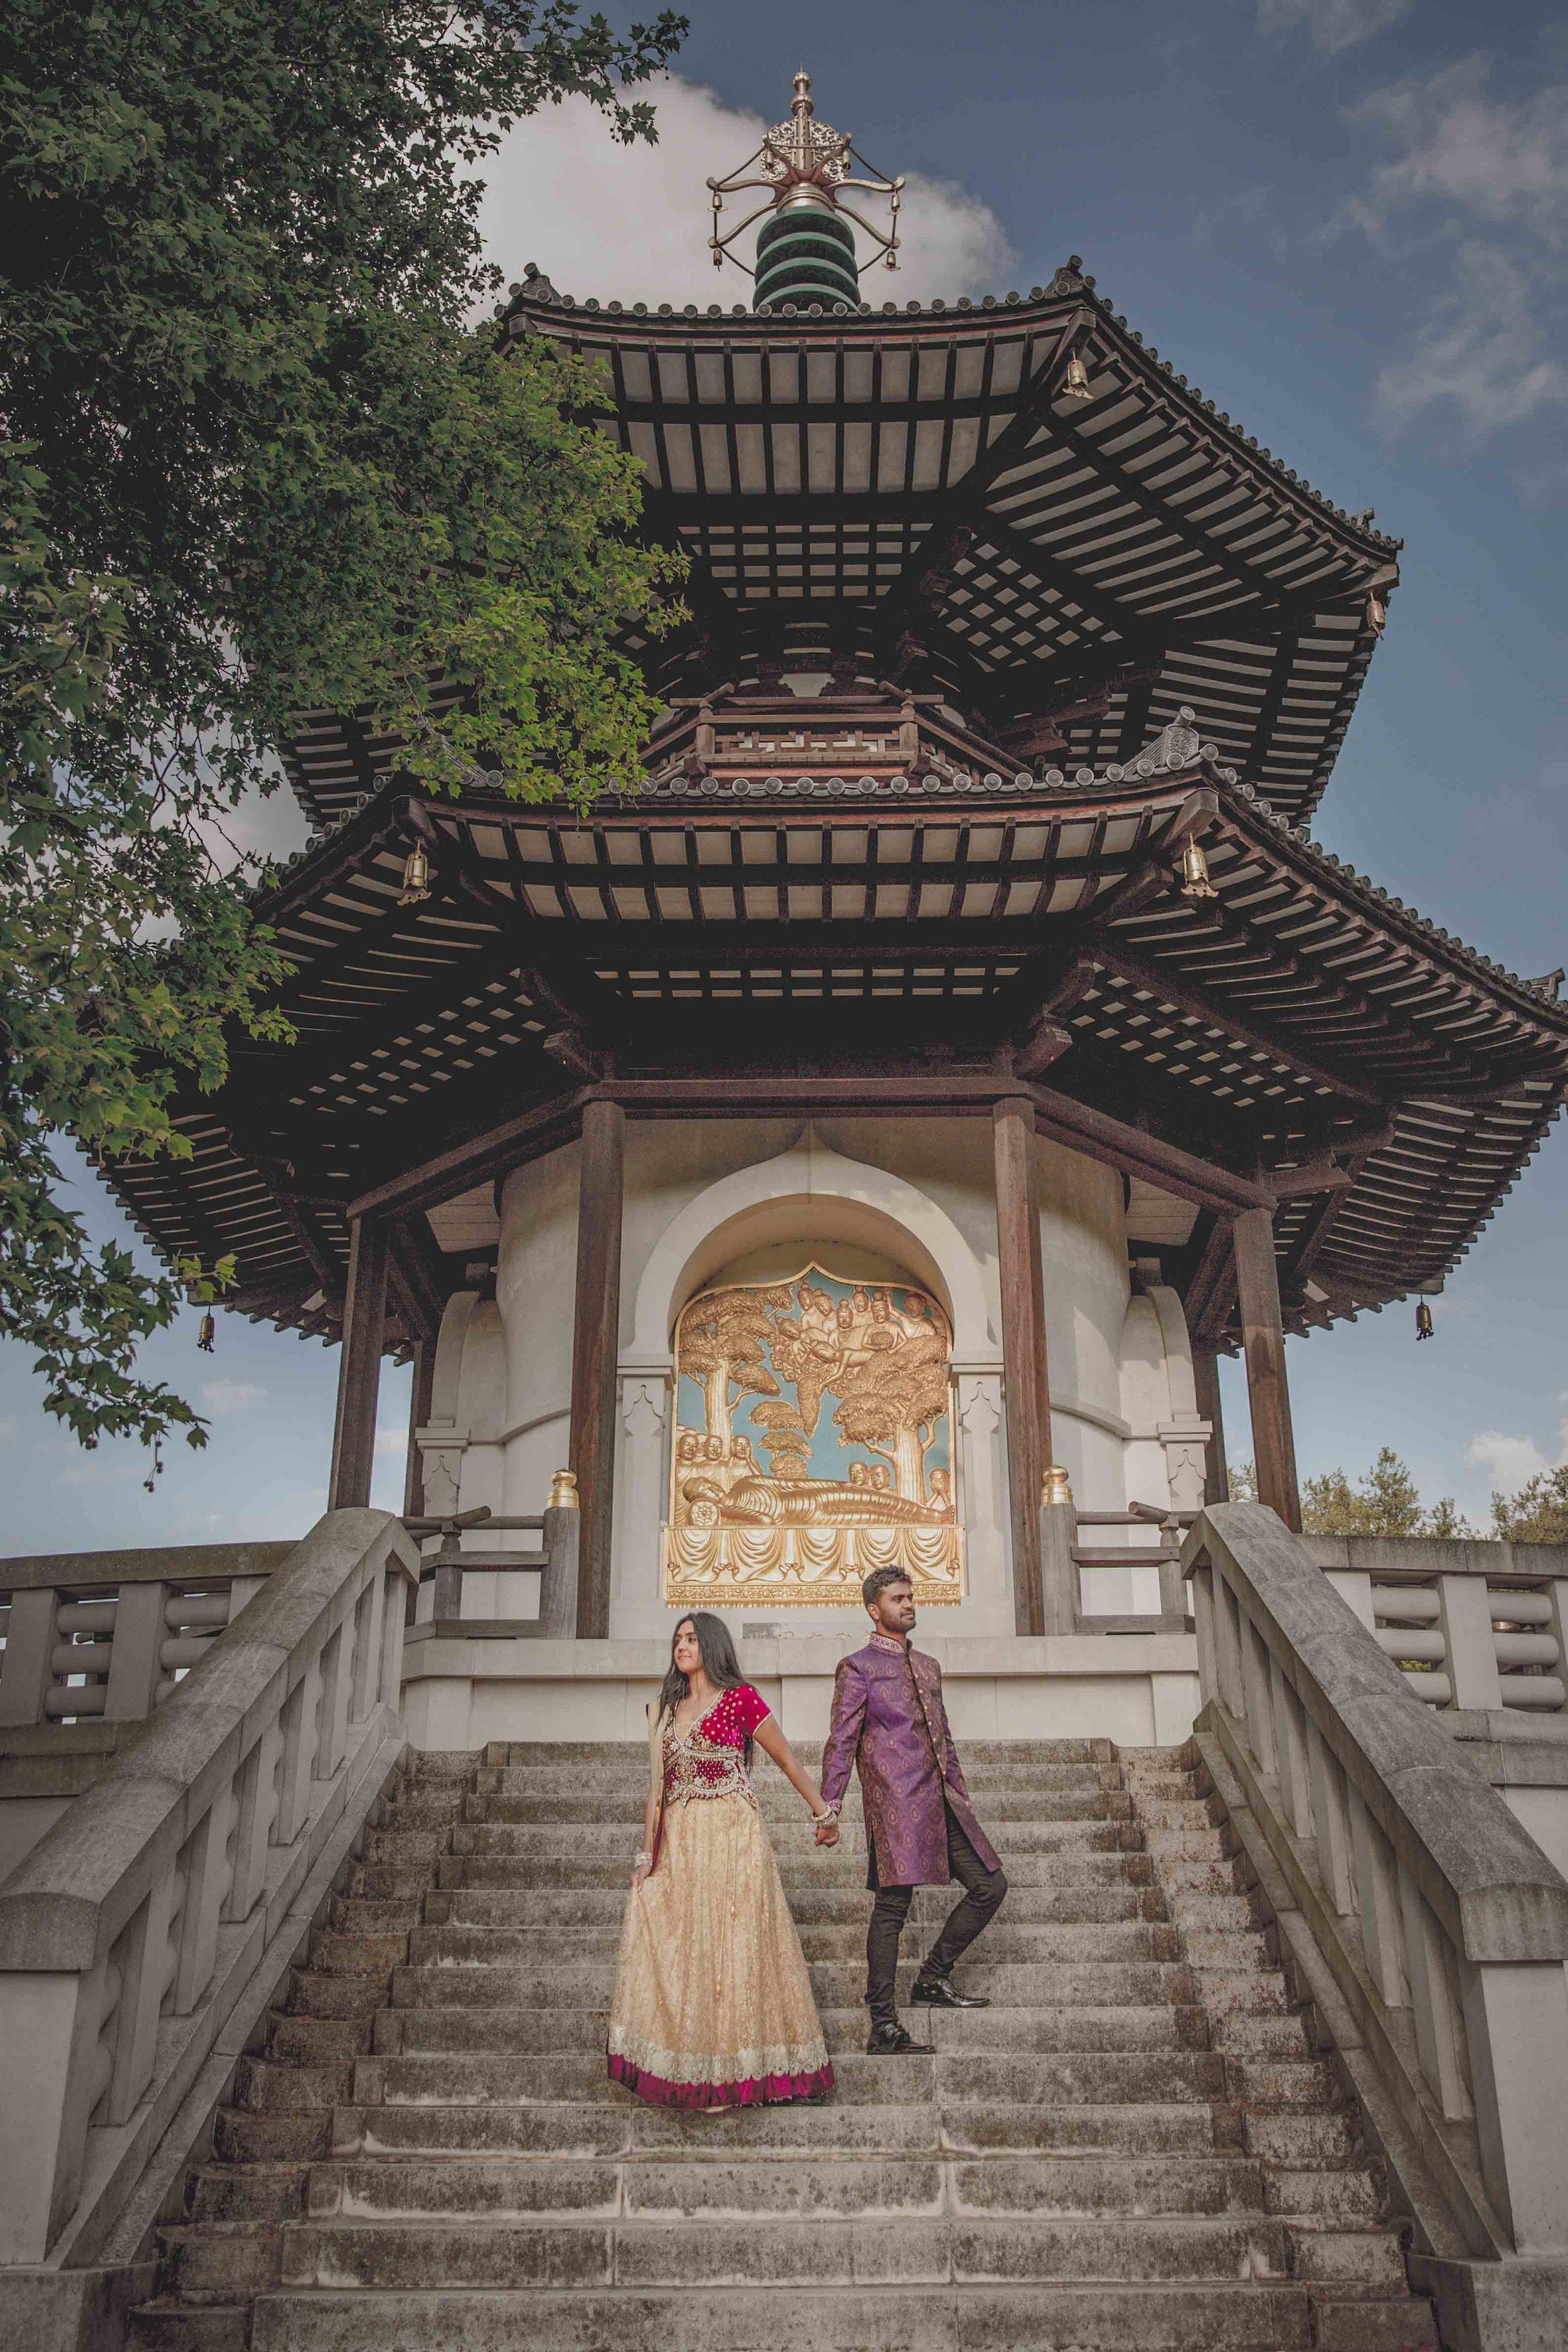 Battersea-park-pre-wedding-photoshoot-shoot-london-asian-wedding-photographer-natalia-smith-photography-9.jpg